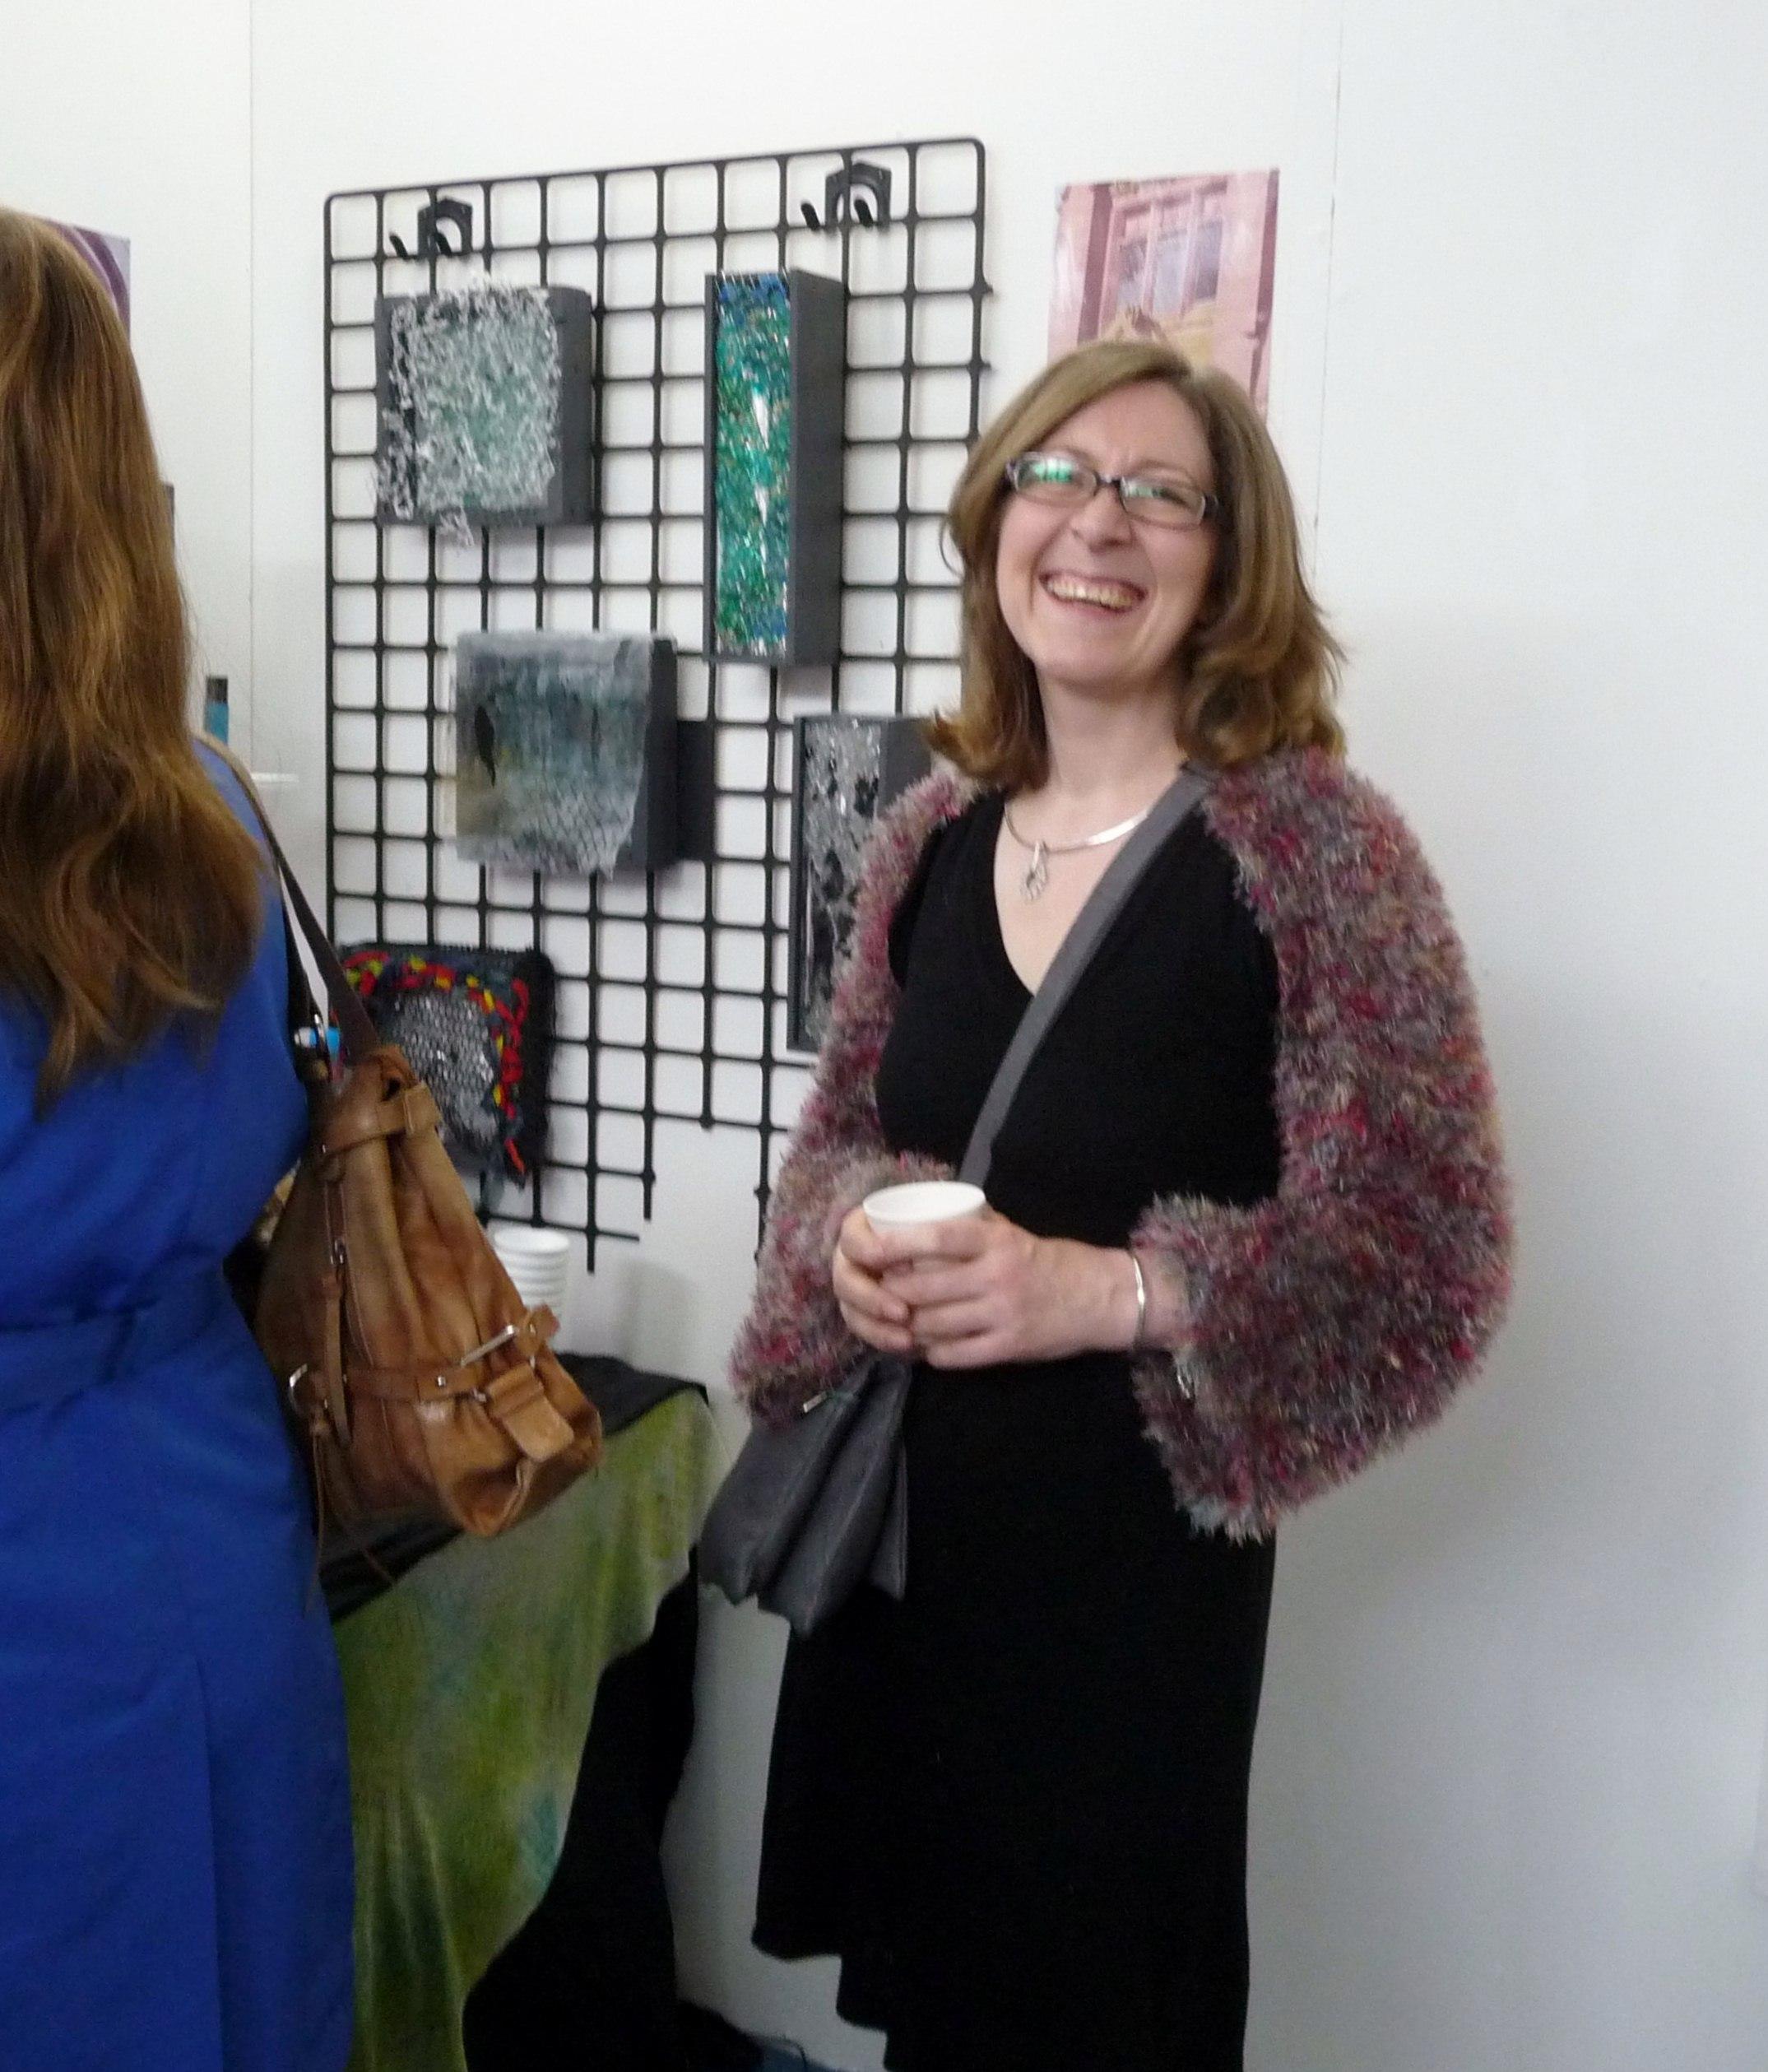 Karen Scott's Foundation exhibition at The Arts Centre, Liverpool Community College, June 2013